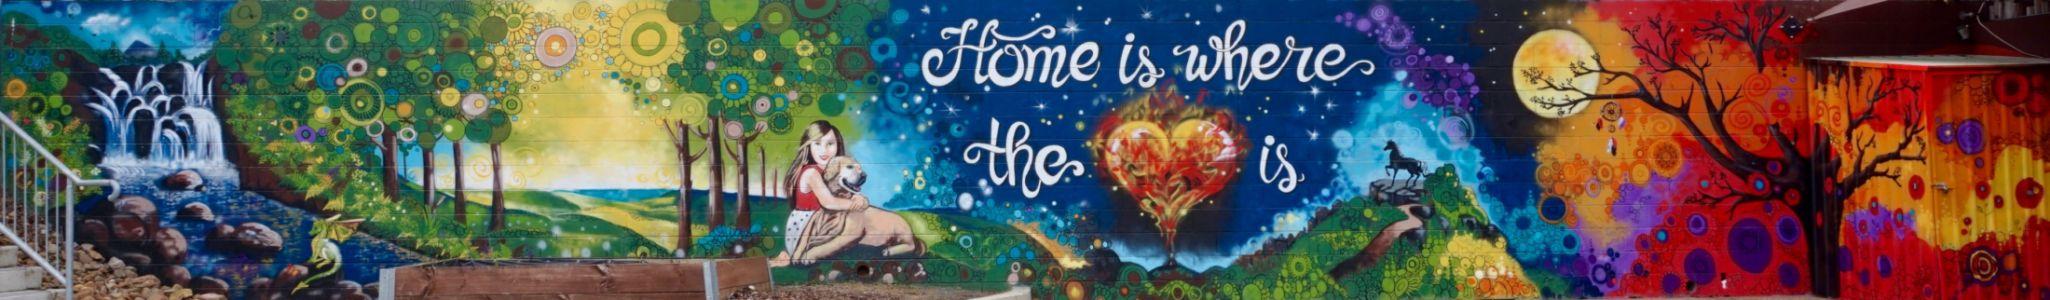 Home is where the heart is_Jindalee Mural_Kat's Mural Art_Kat Smirnoff